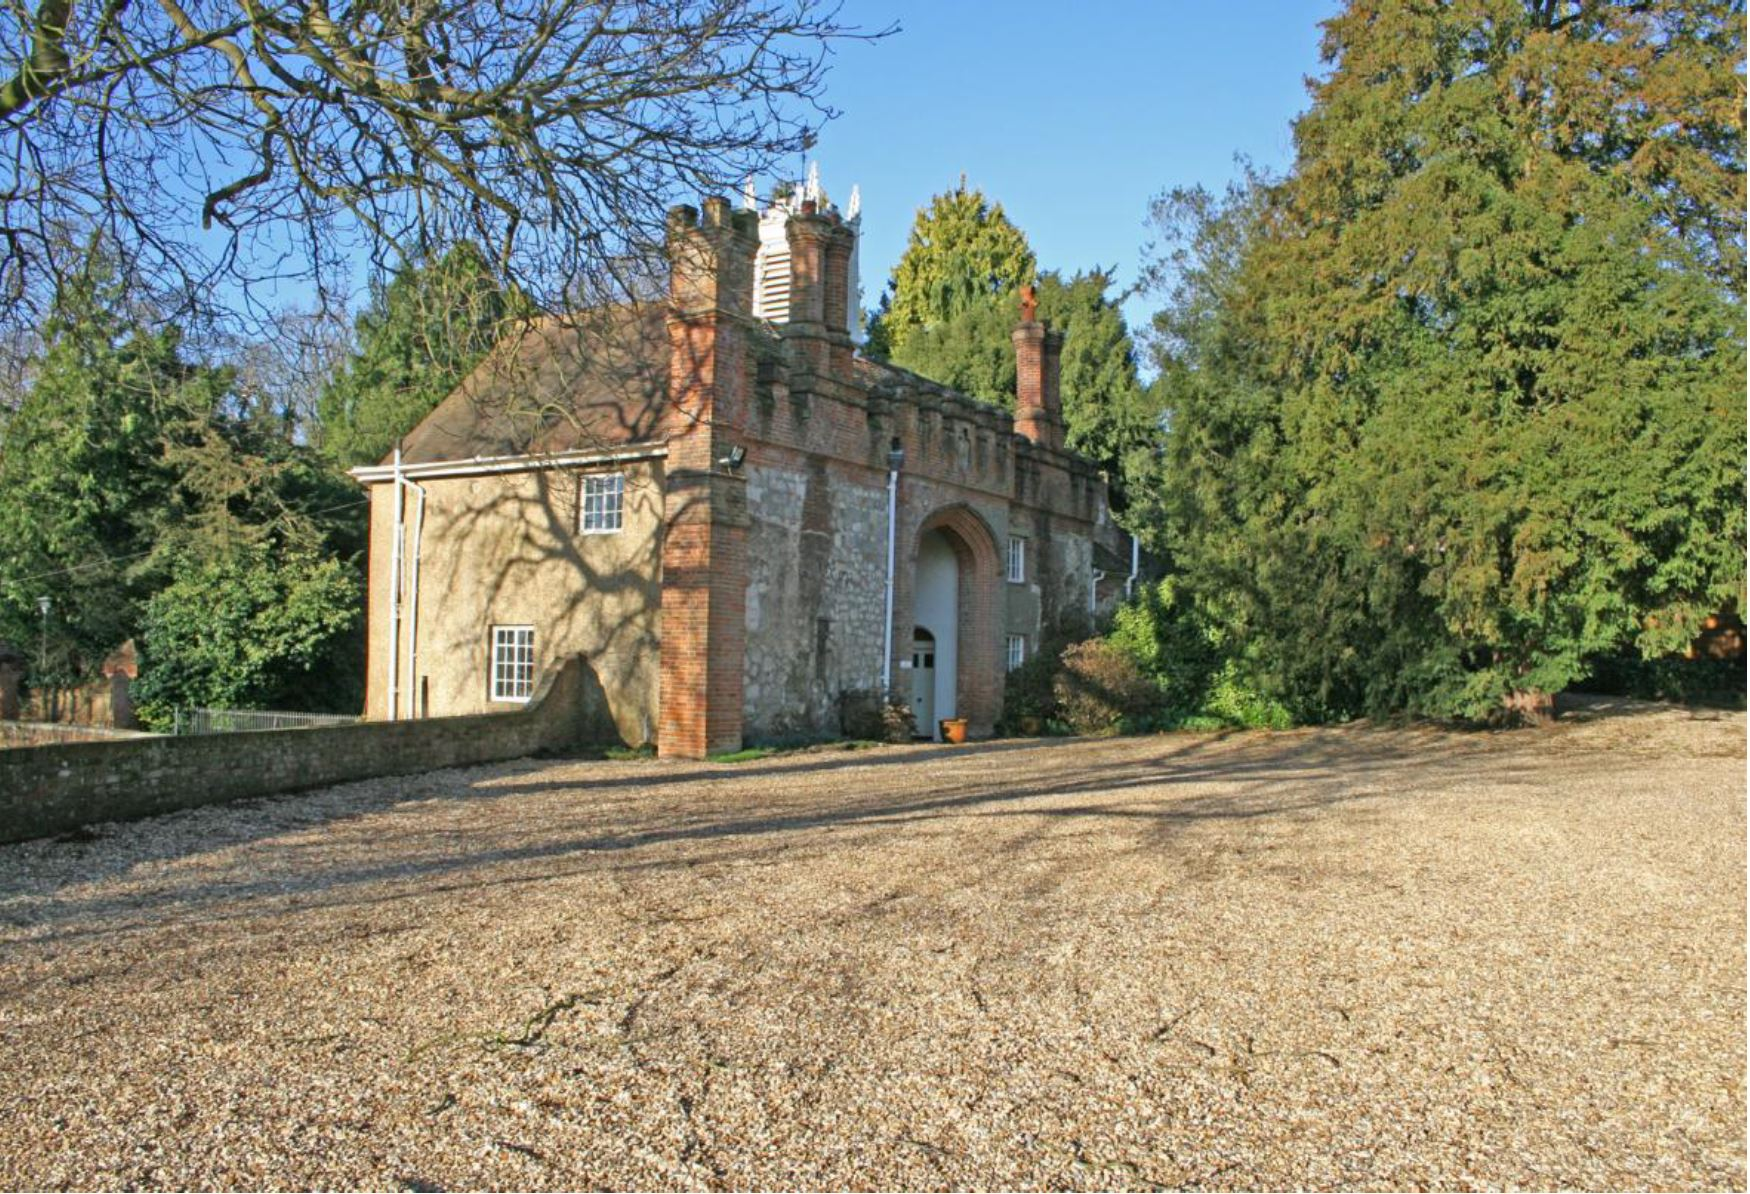 New car park inside Great Gate, Farnham Castle